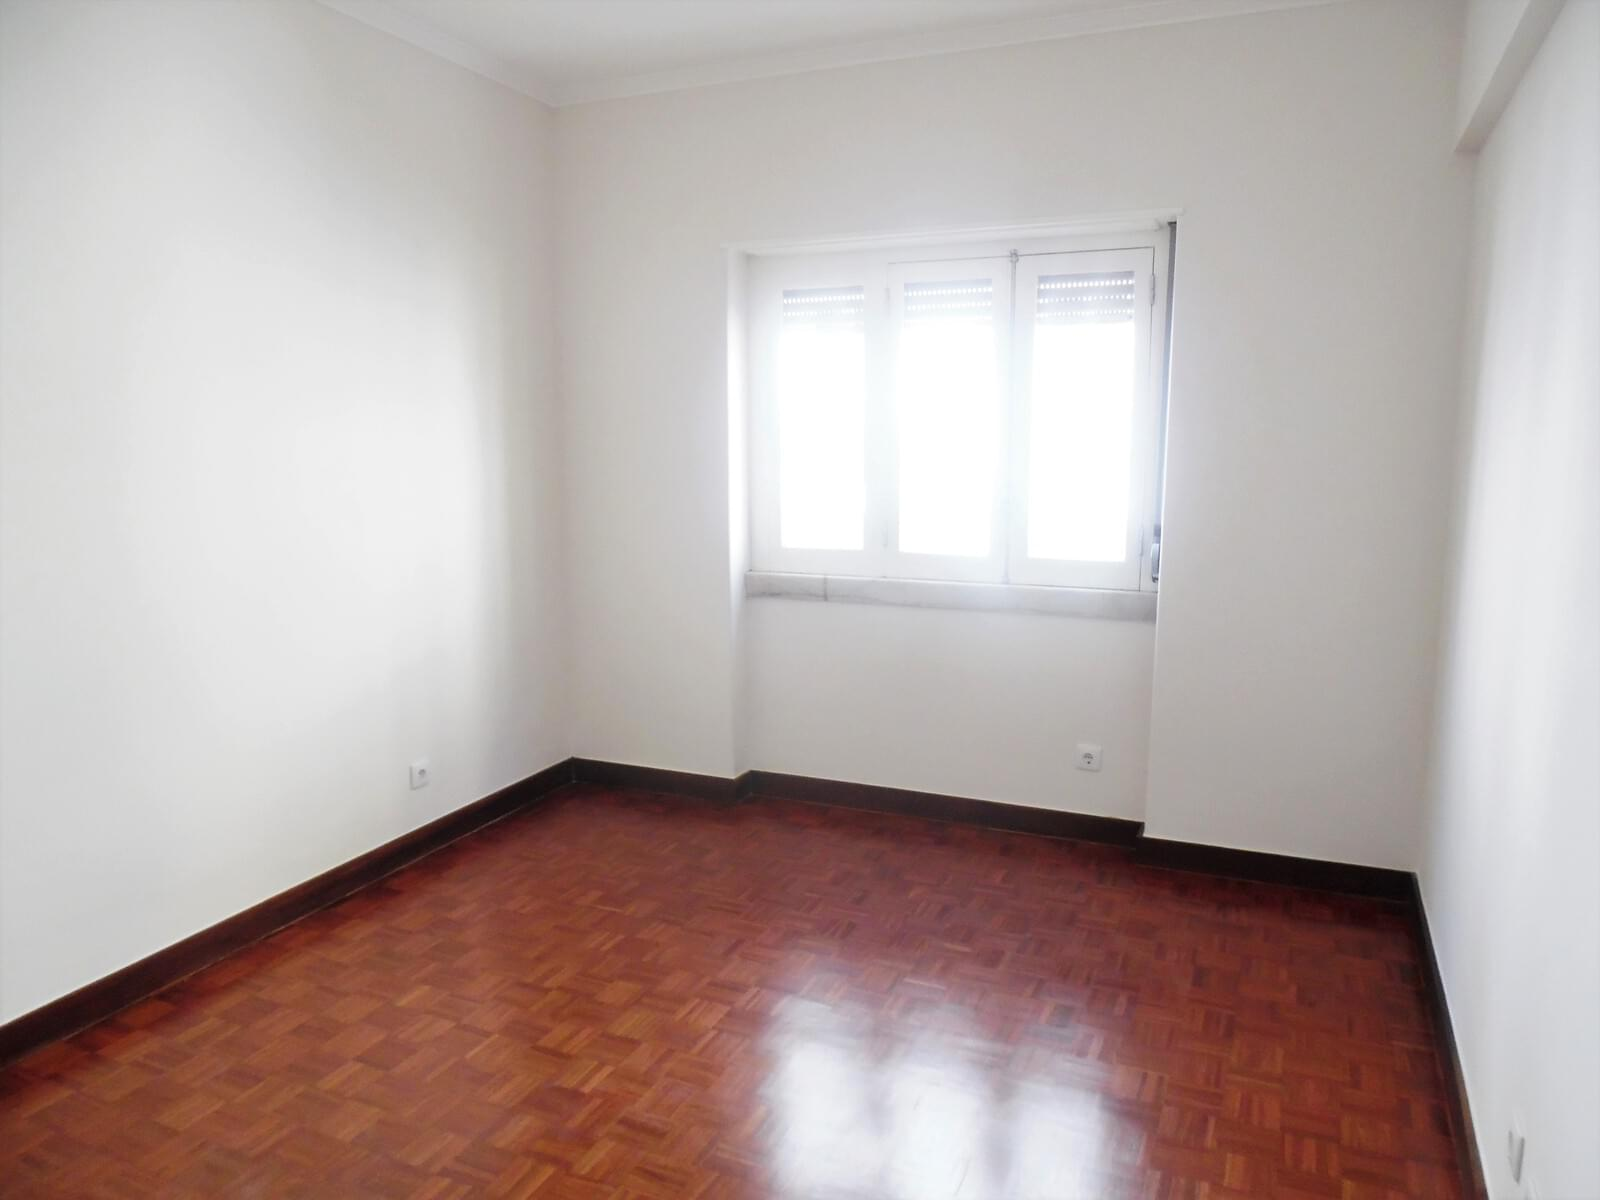 pf17621-apartamento-t4-lisboa-0a43c3f5-68eb-432d-a9bf-e0543e818fbe